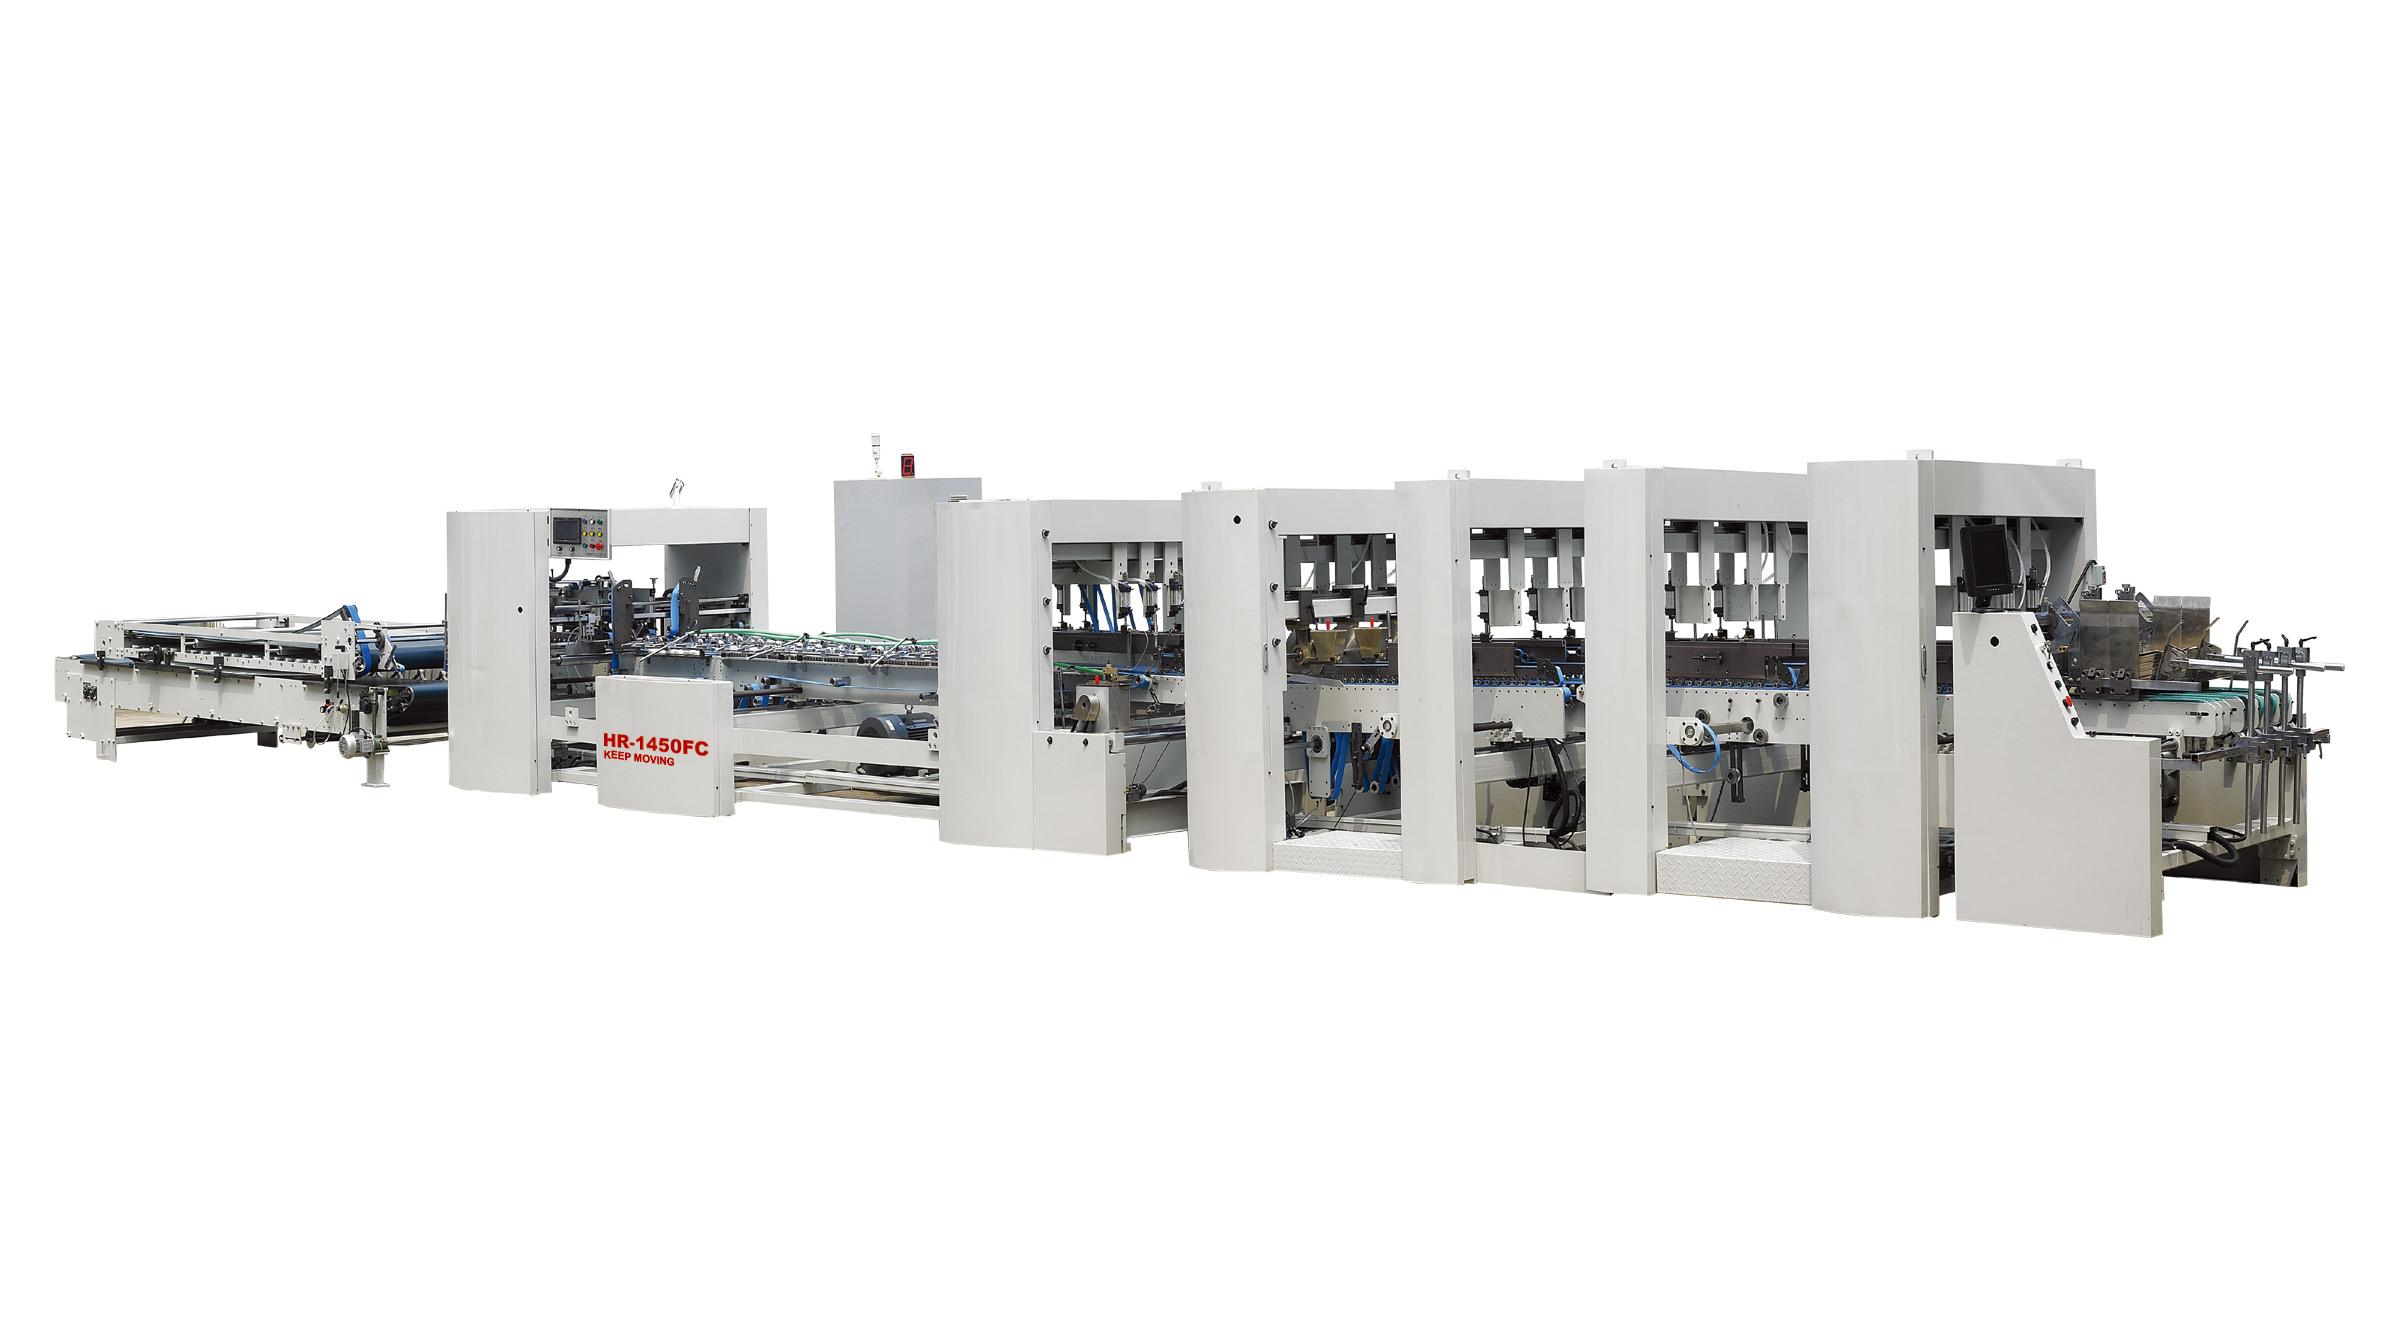 自动高速糊折盒机 HR-1450FC